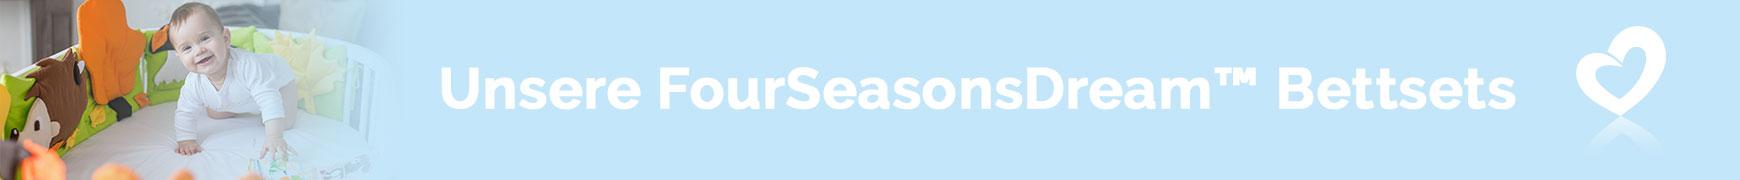 FourSeasonsDream™ Bettsets